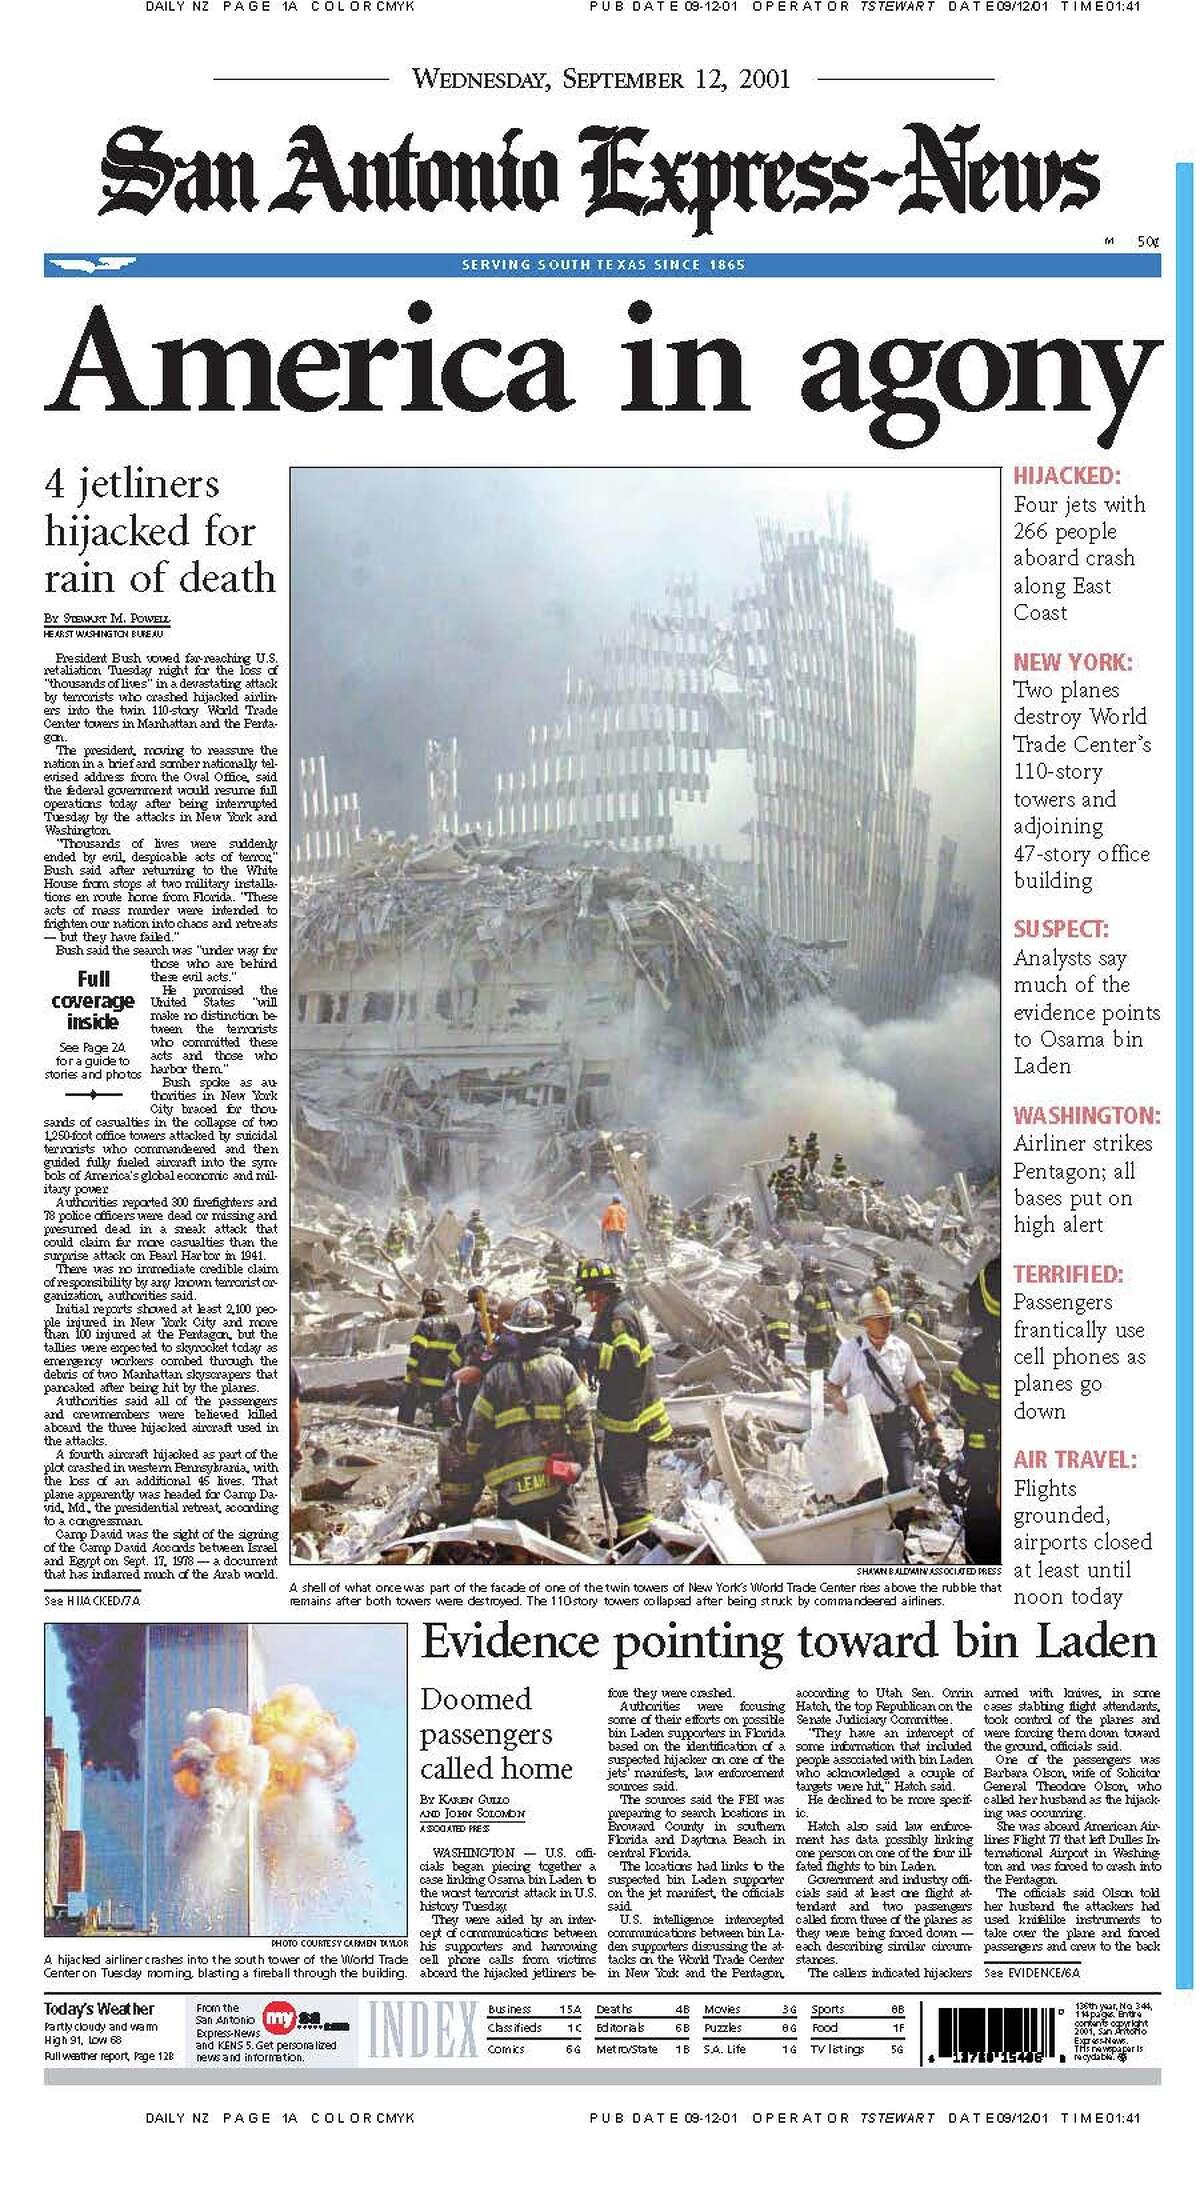 Sept. 12, 2001